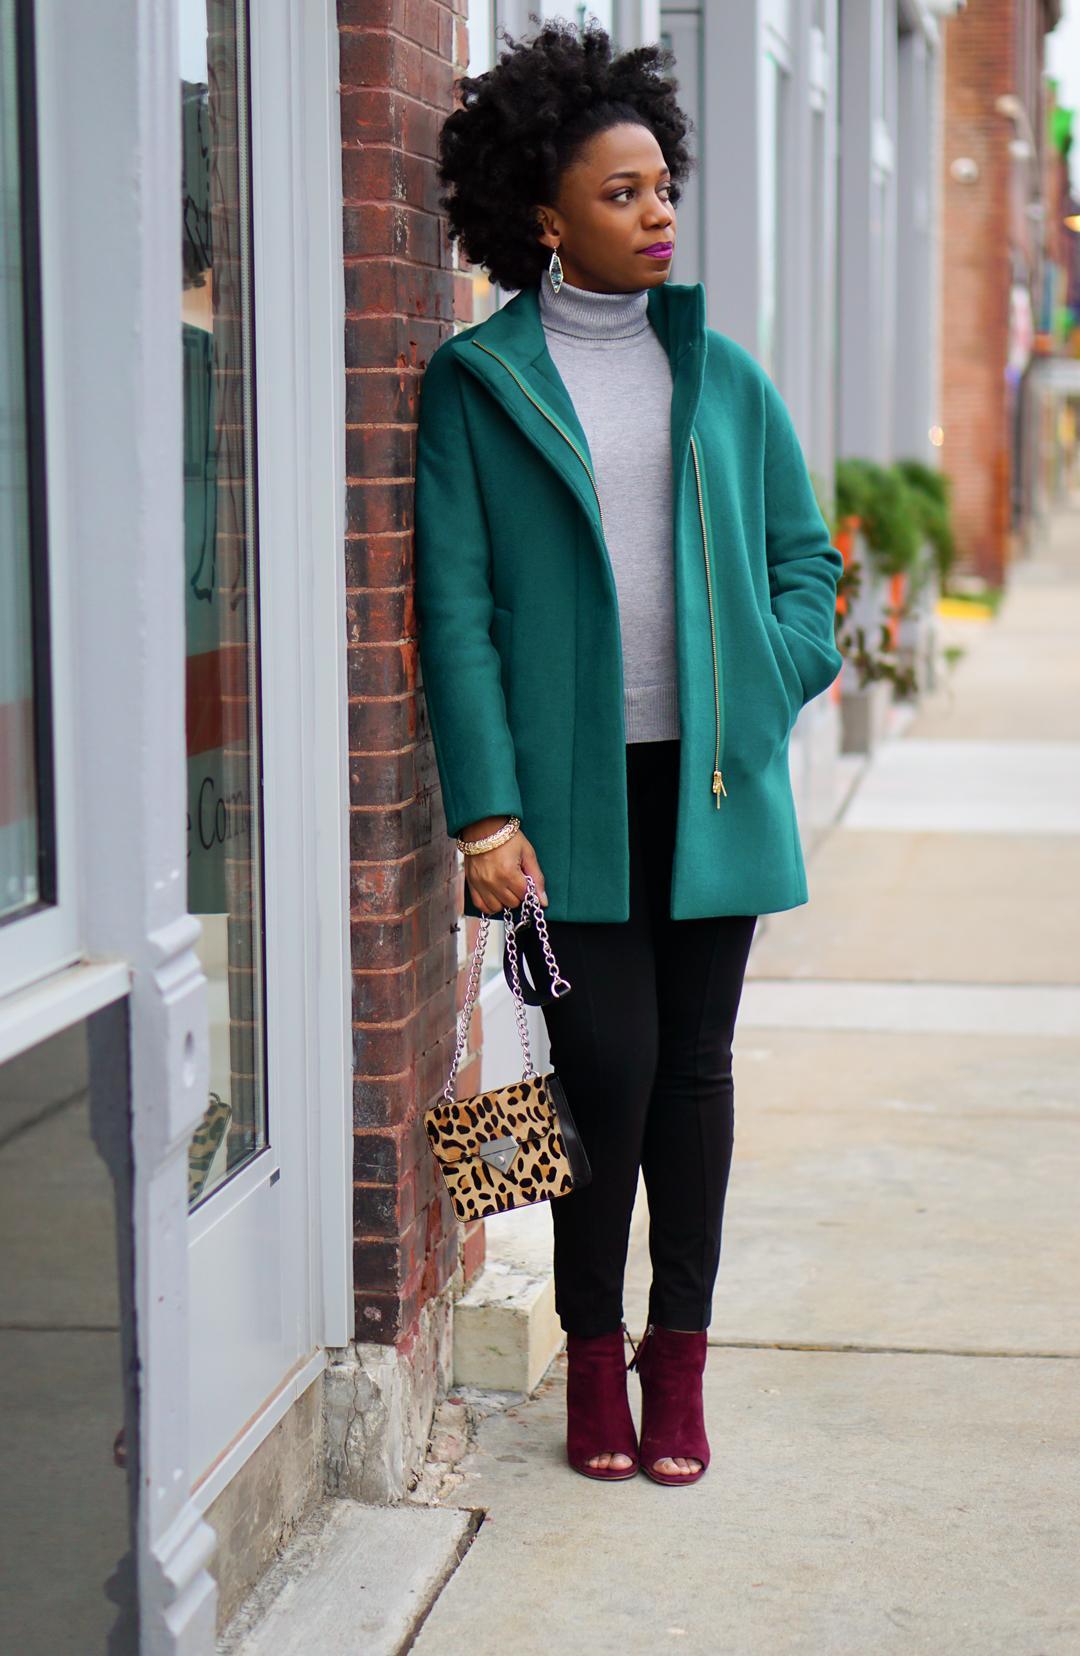 Colorful winter coat